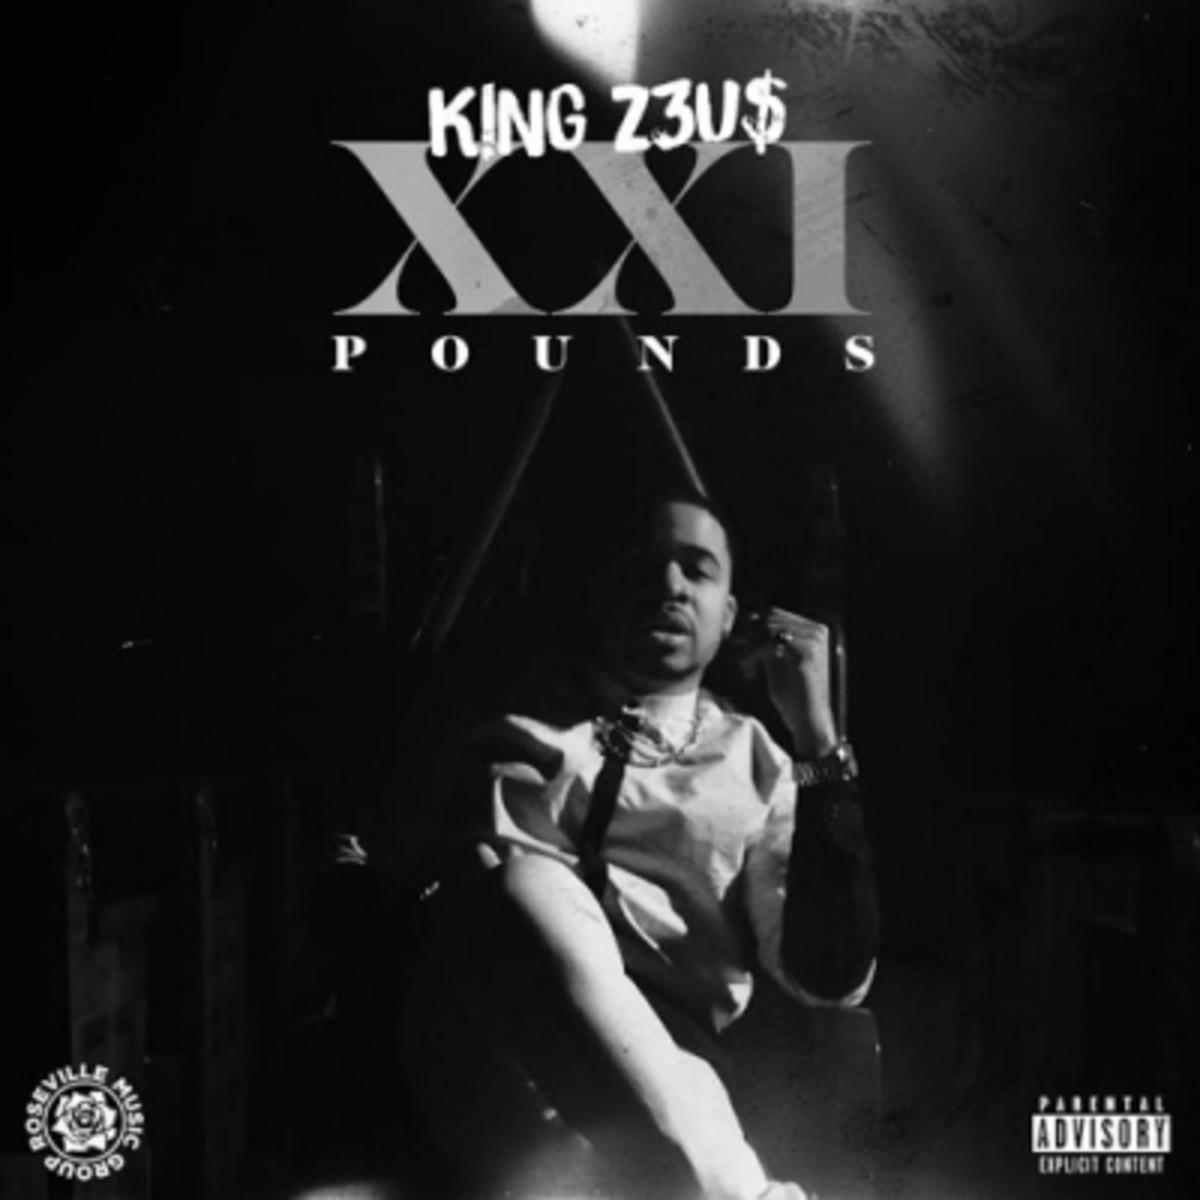 king-zeus-21-pounds.jpg